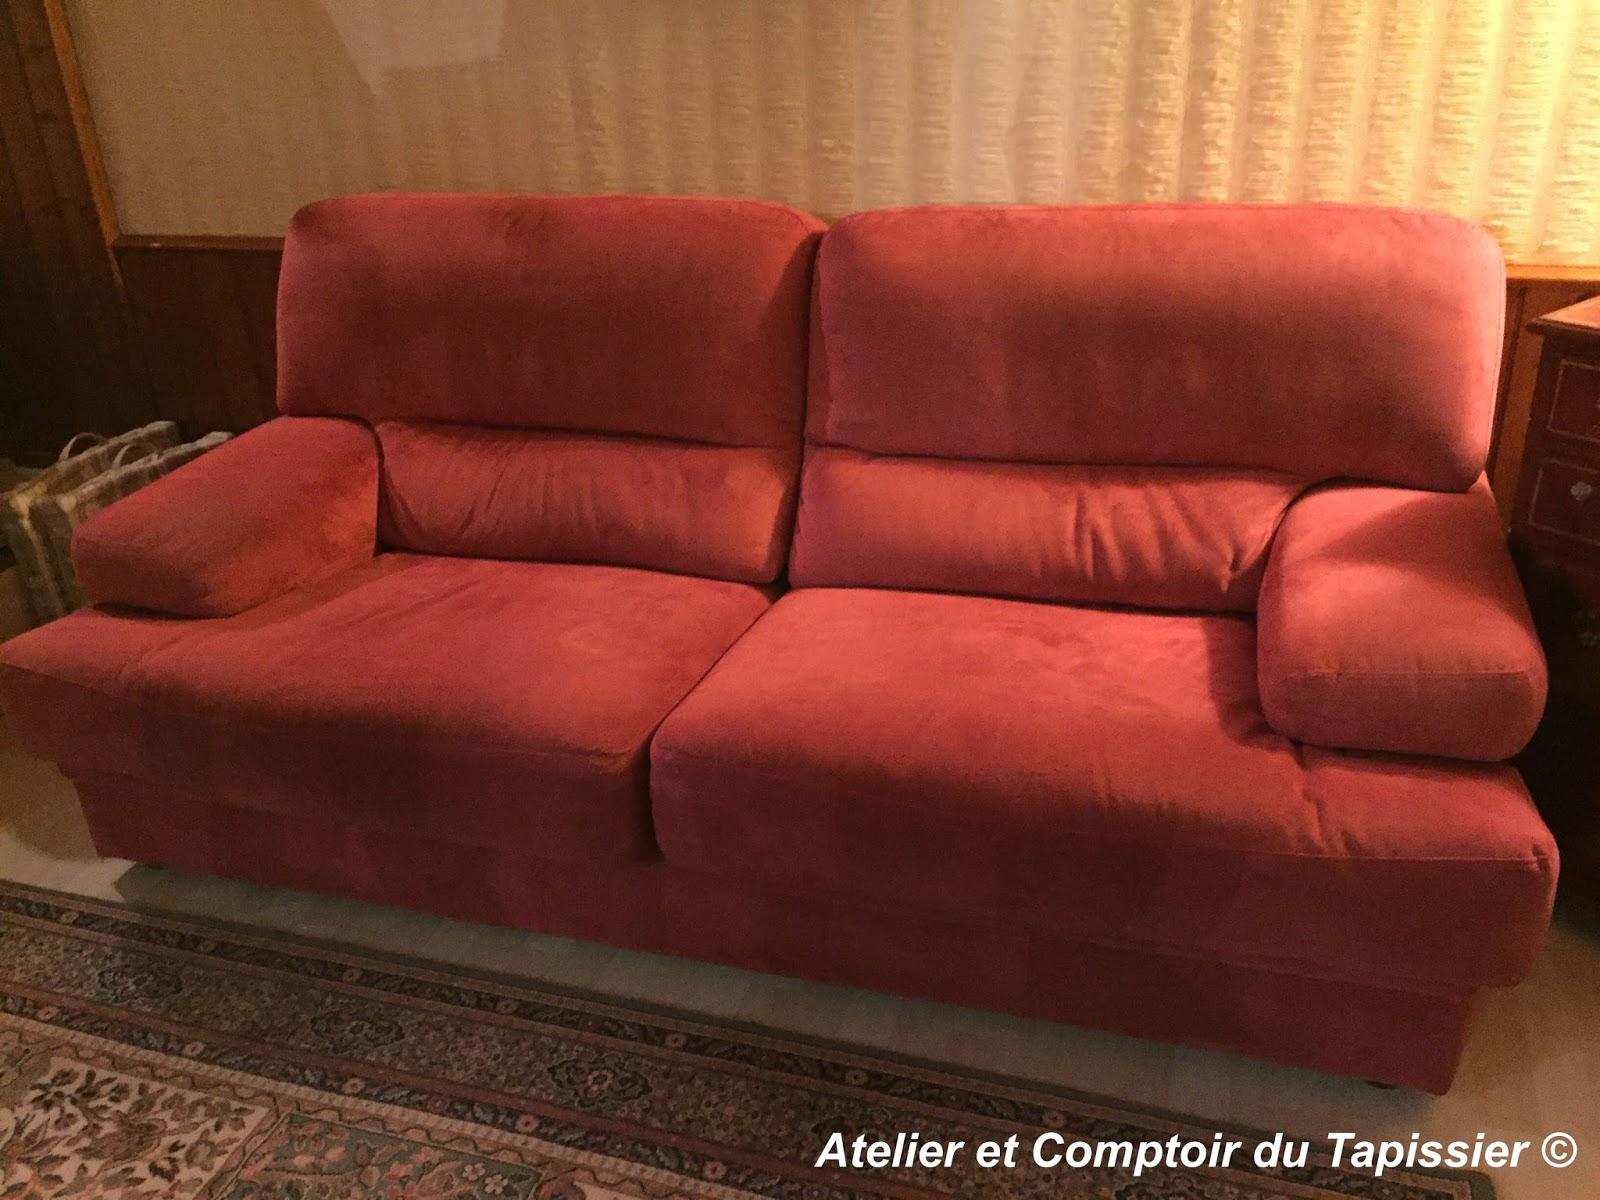 atelier et comptoir du tapissier janvier 2018. Black Bedroom Furniture Sets. Home Design Ideas